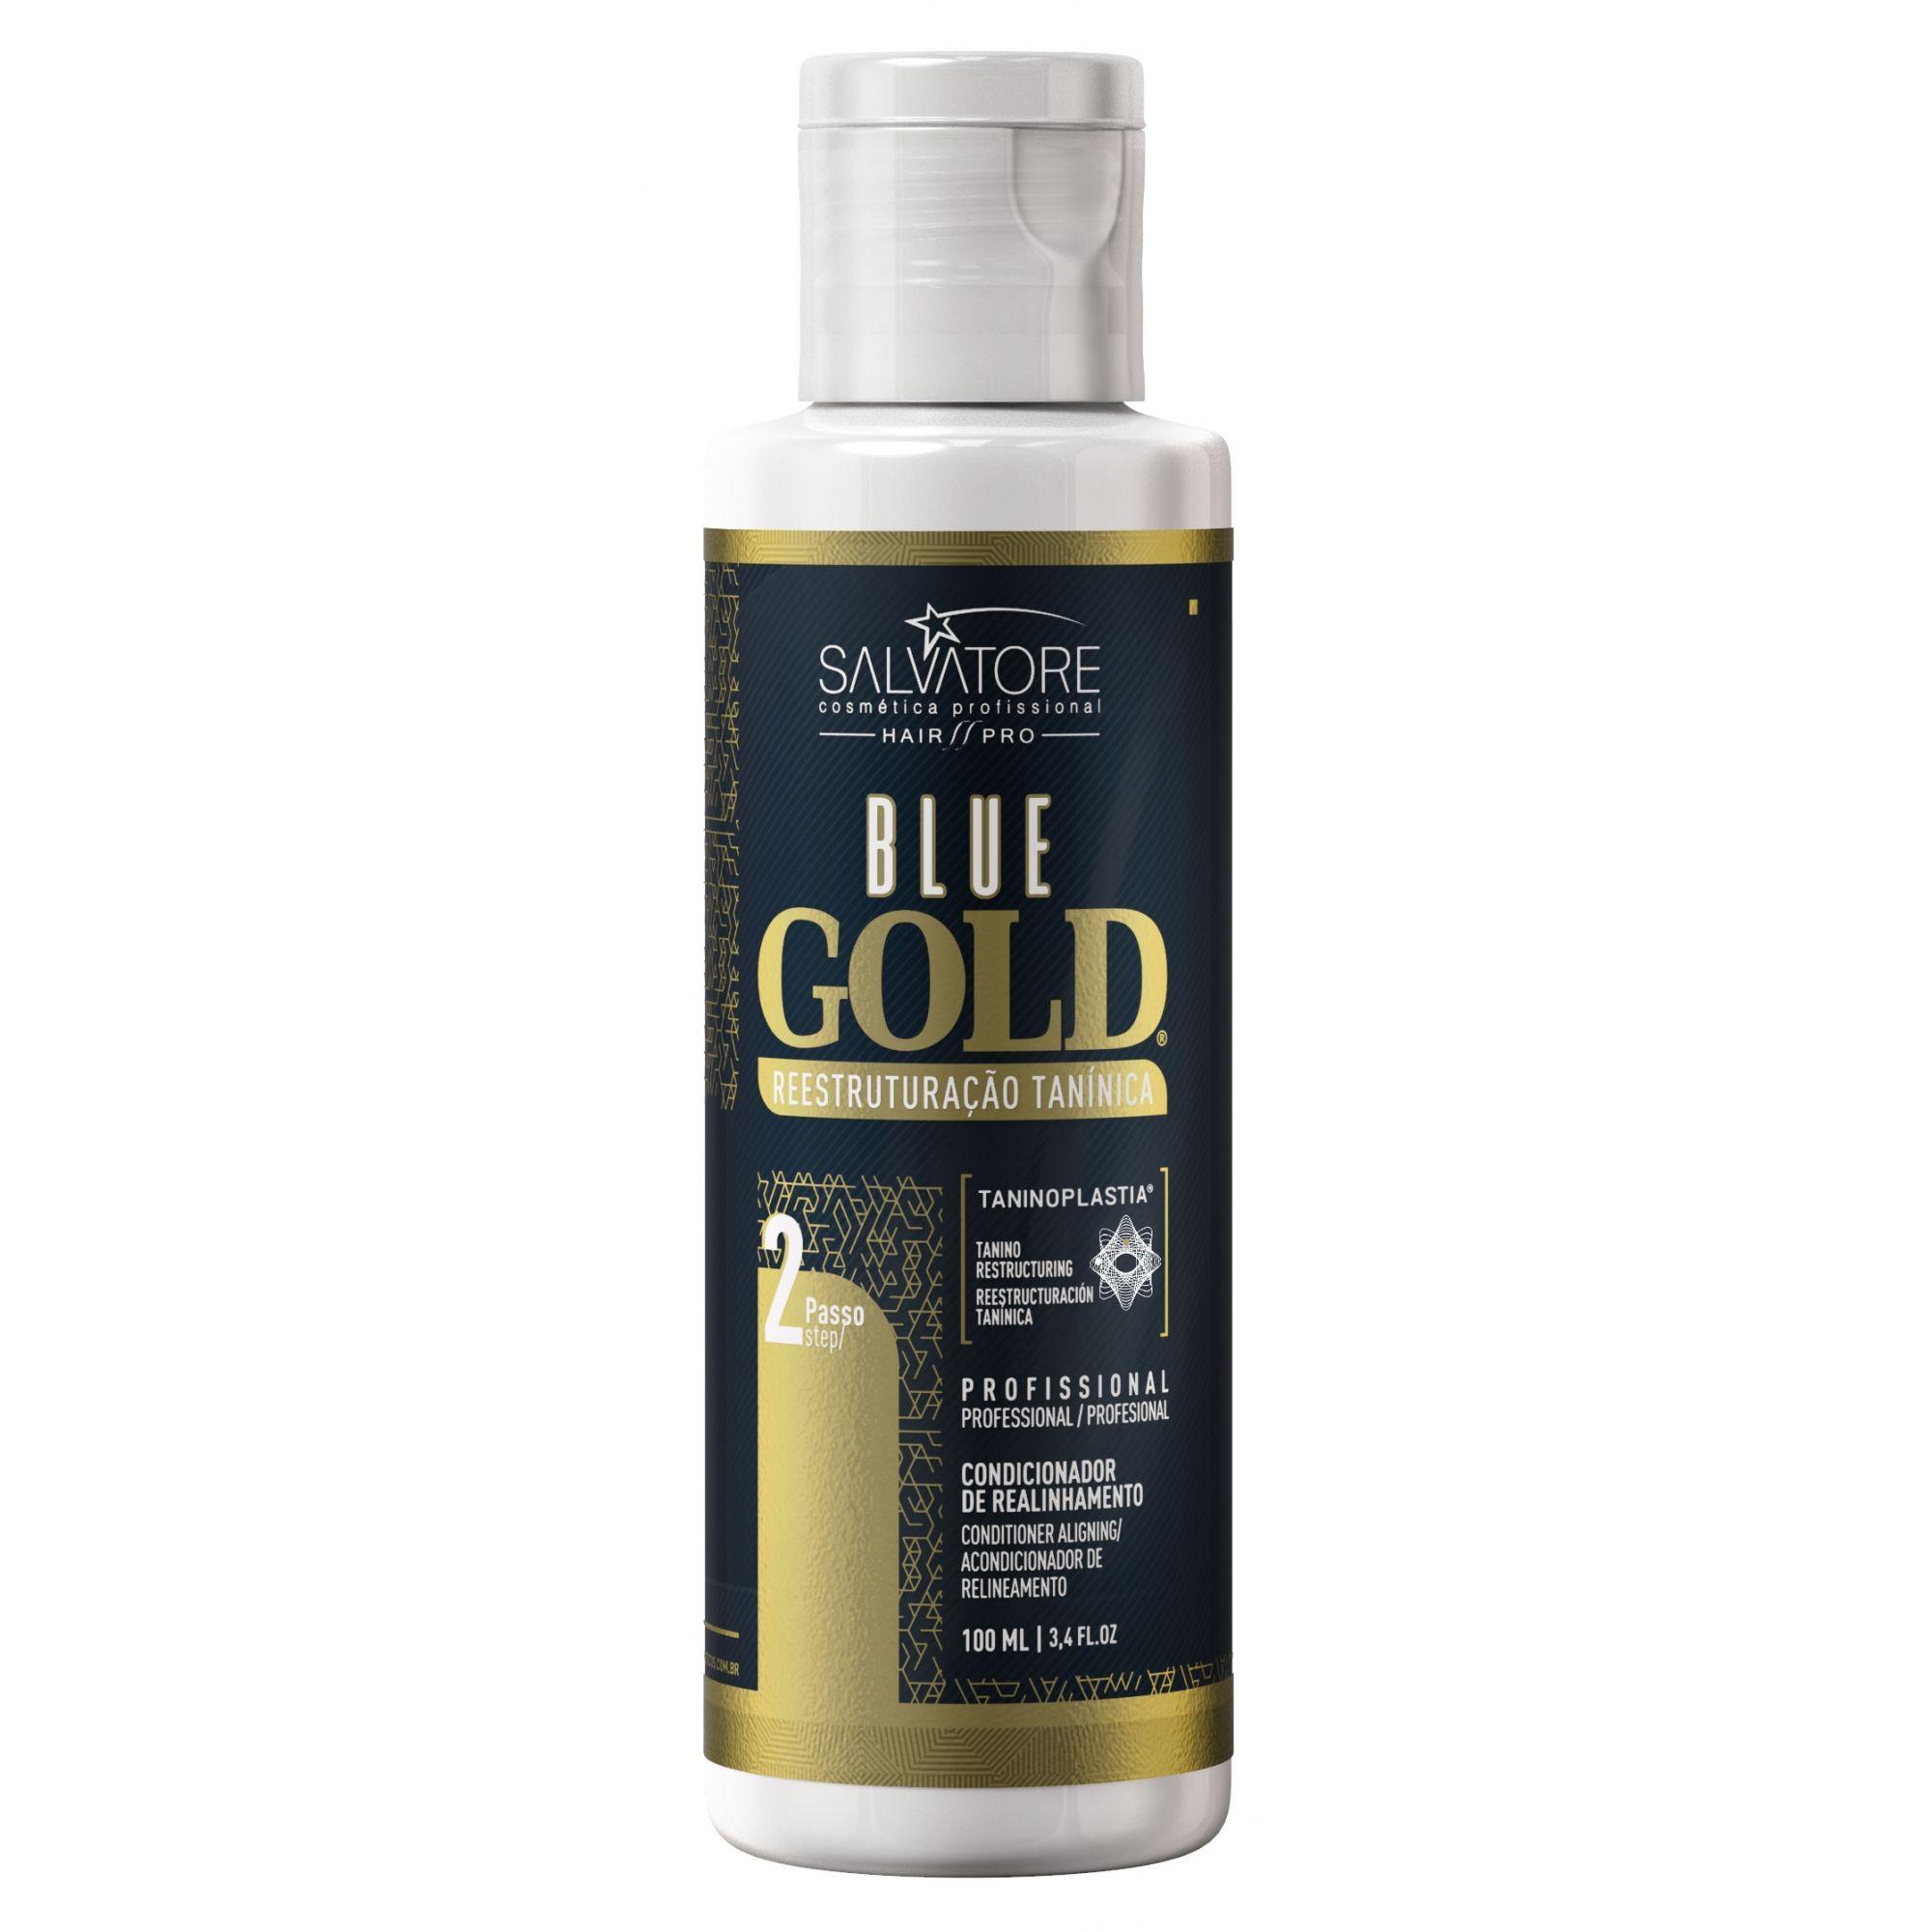 Kit Blue Gold 100 ML - 10 anos de Taninoplastia